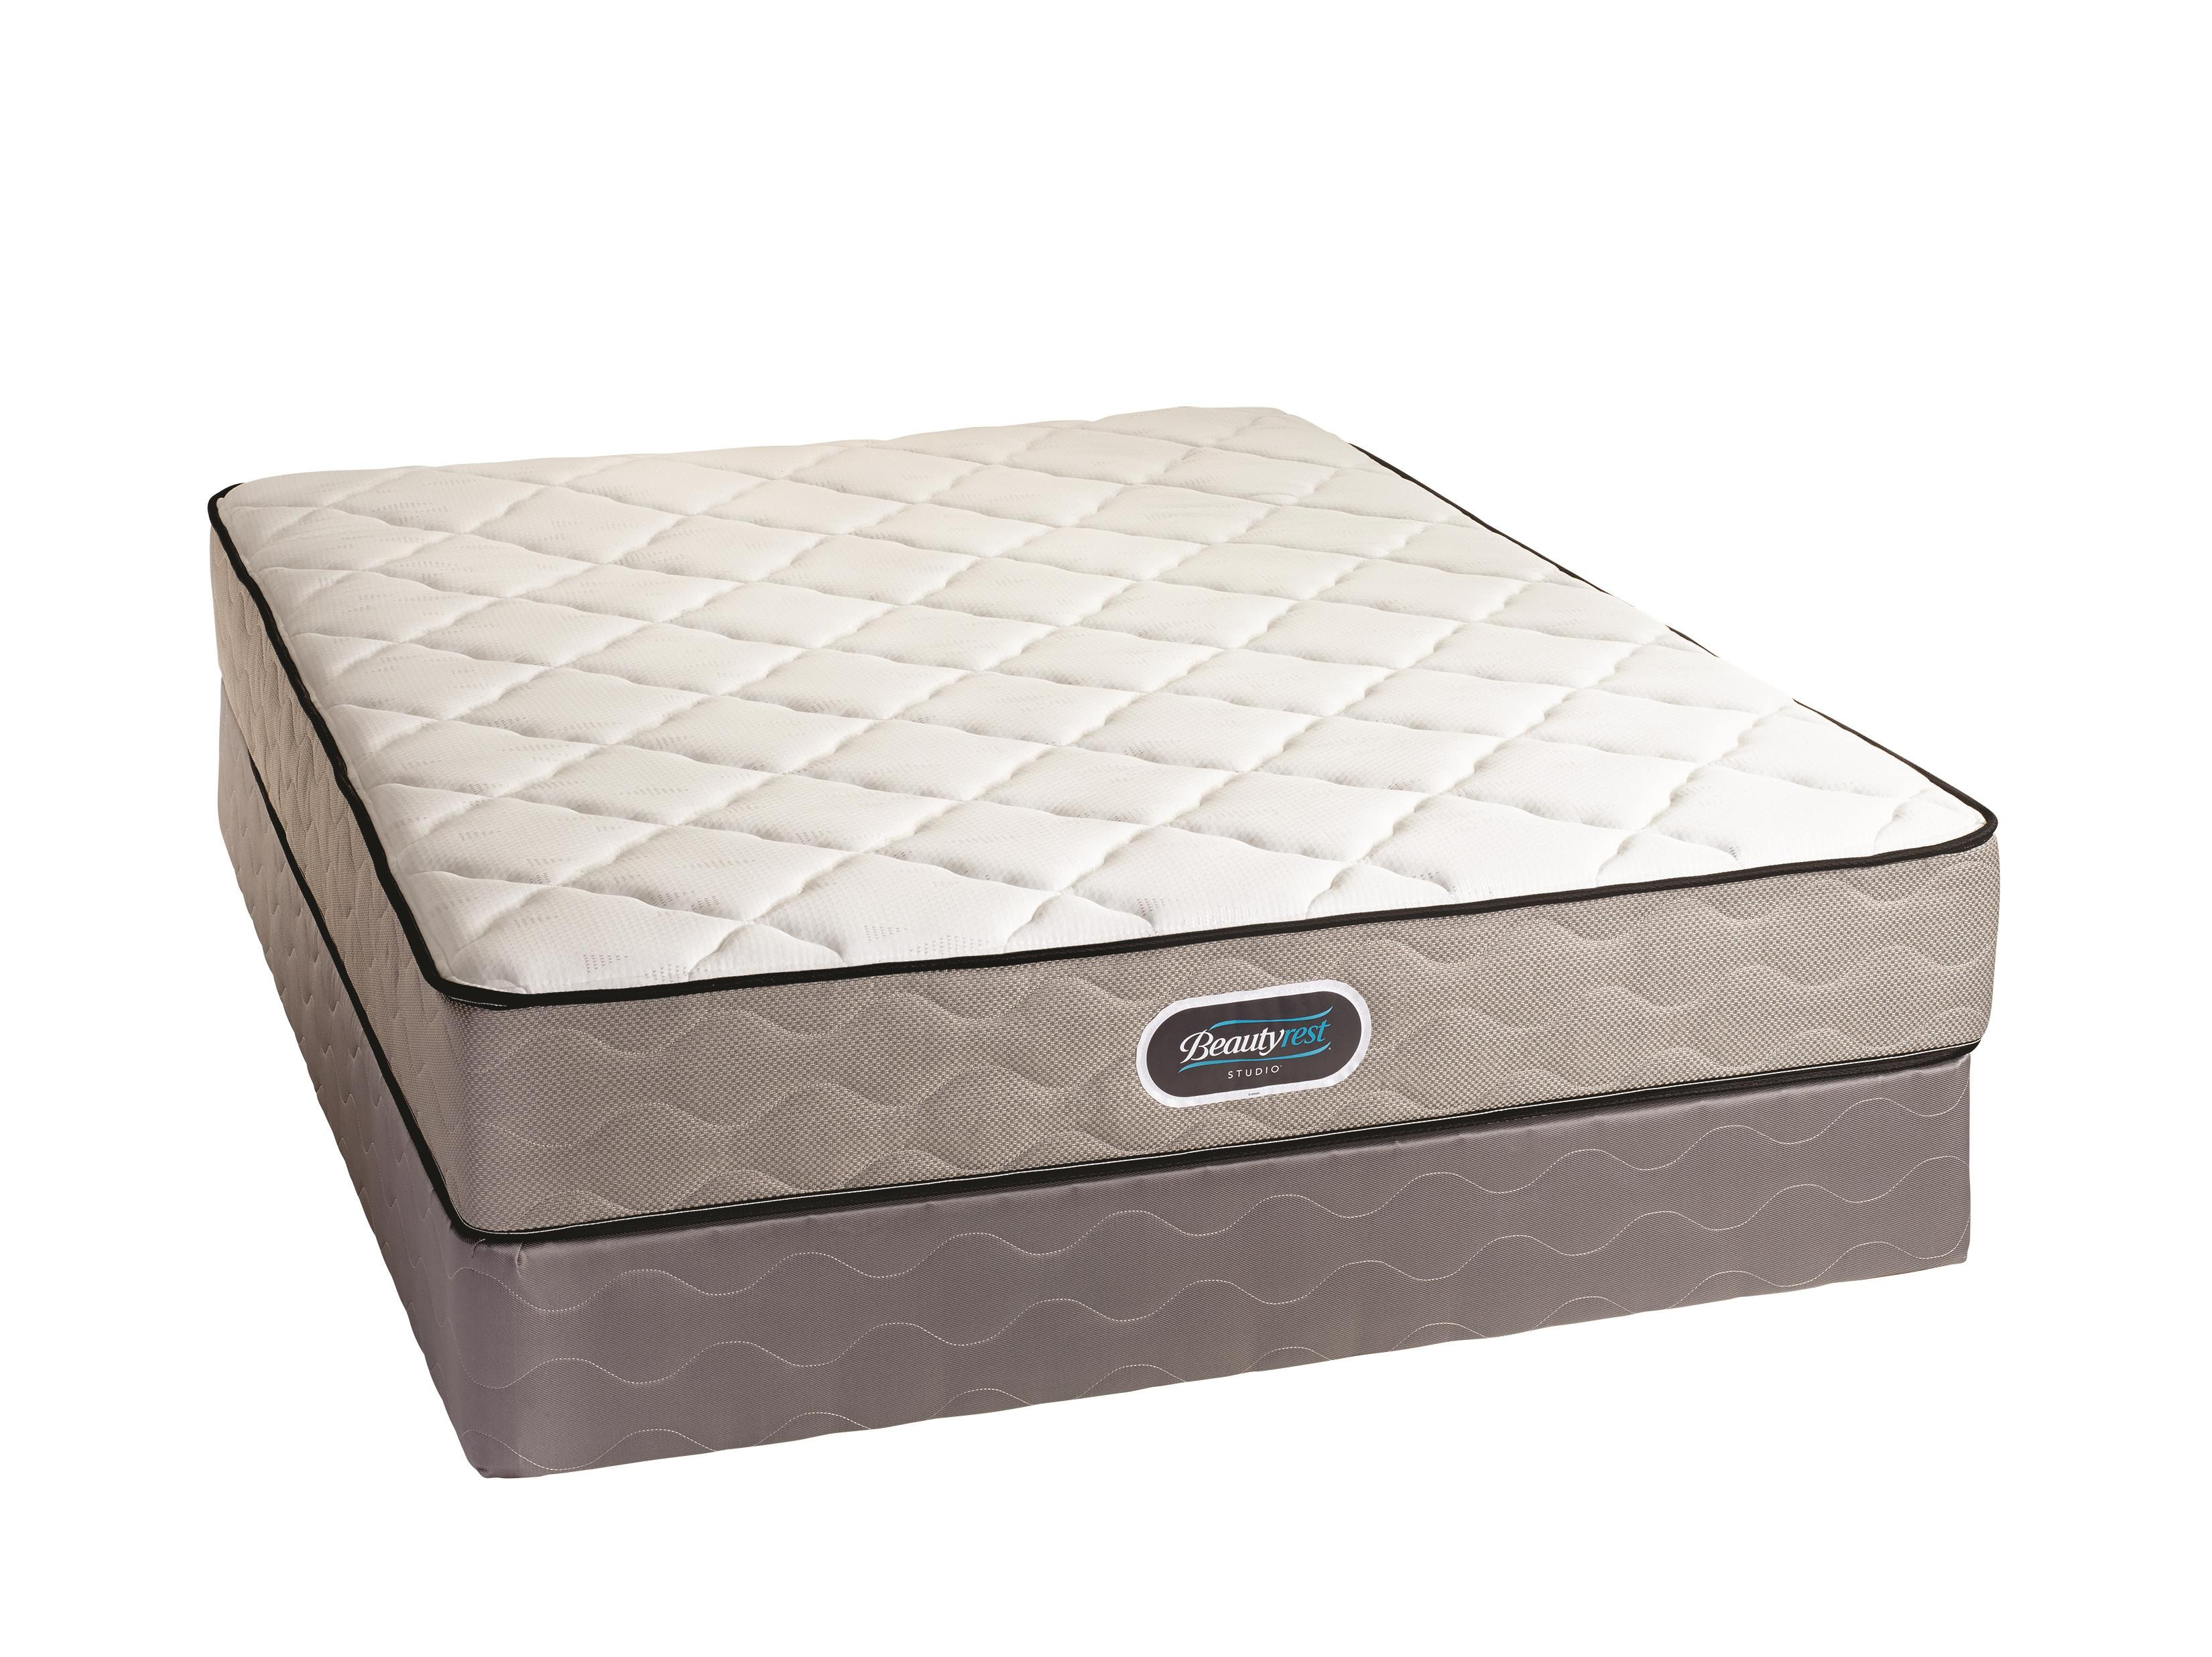 simmons beautyrest studio 2015 gentry full firm tight top mattress